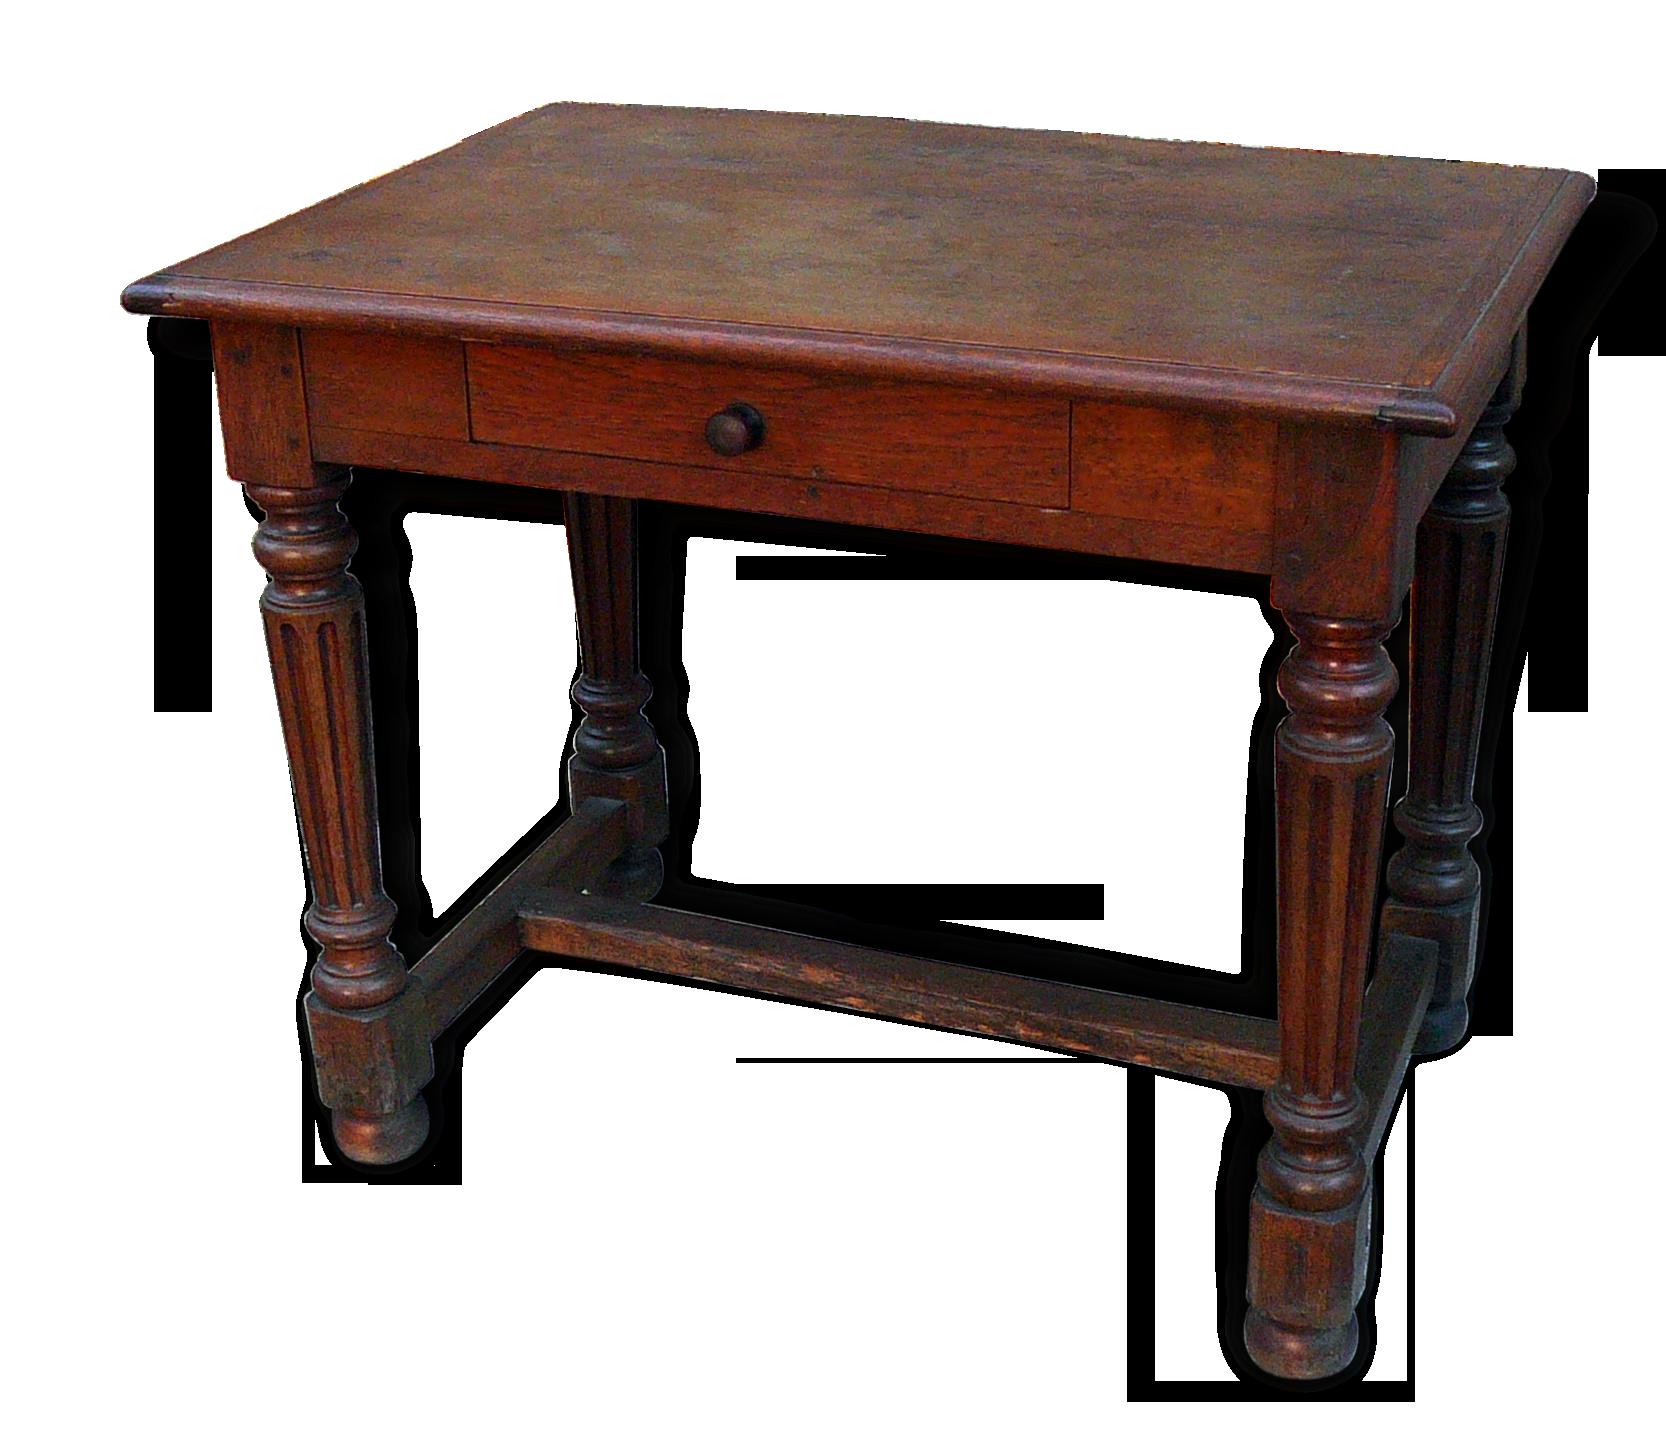 Table basse chene massif rustique minimalist table basse bois